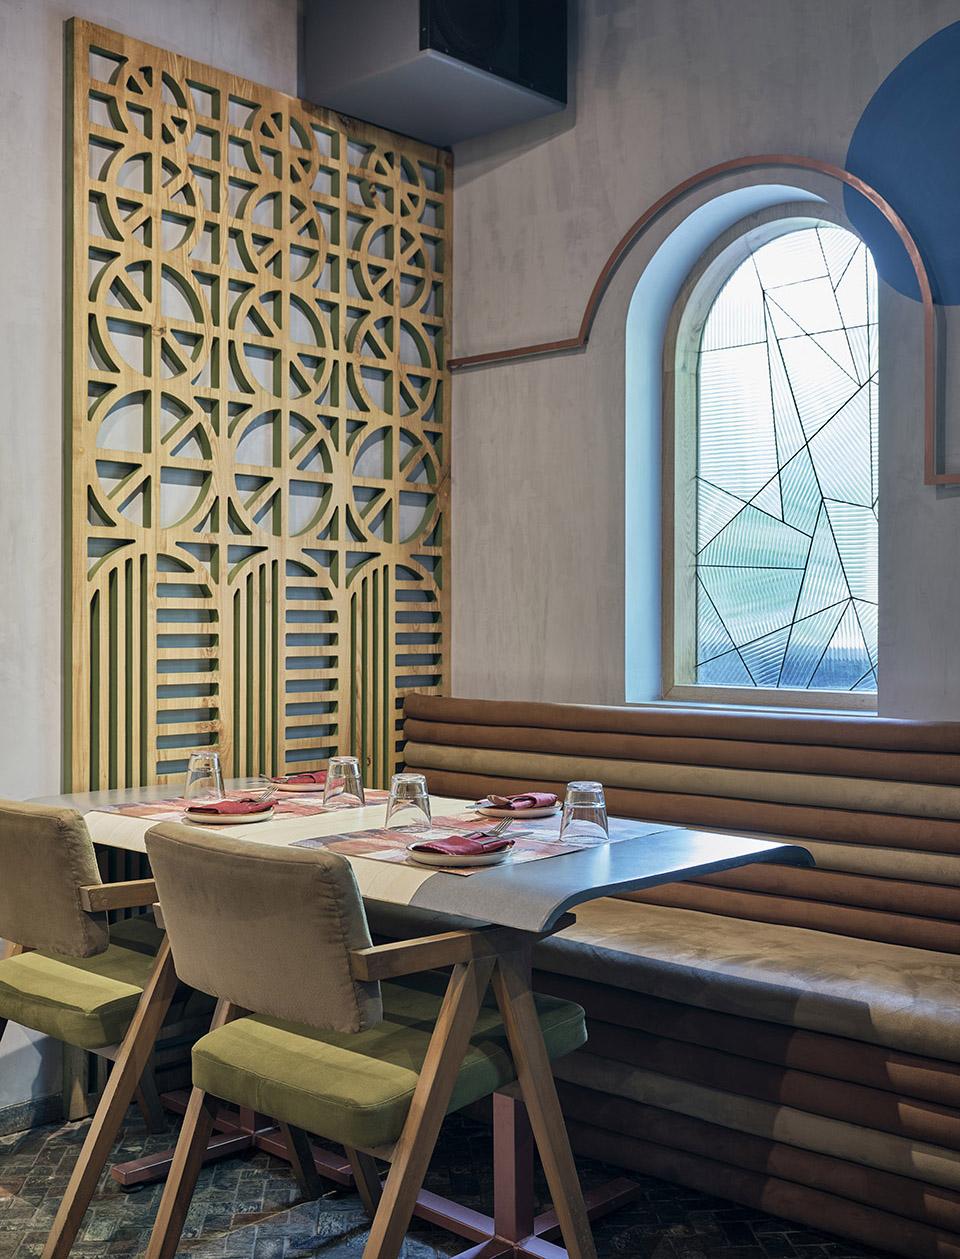 023-misu-restaurant-by-fadd-studio.jpg